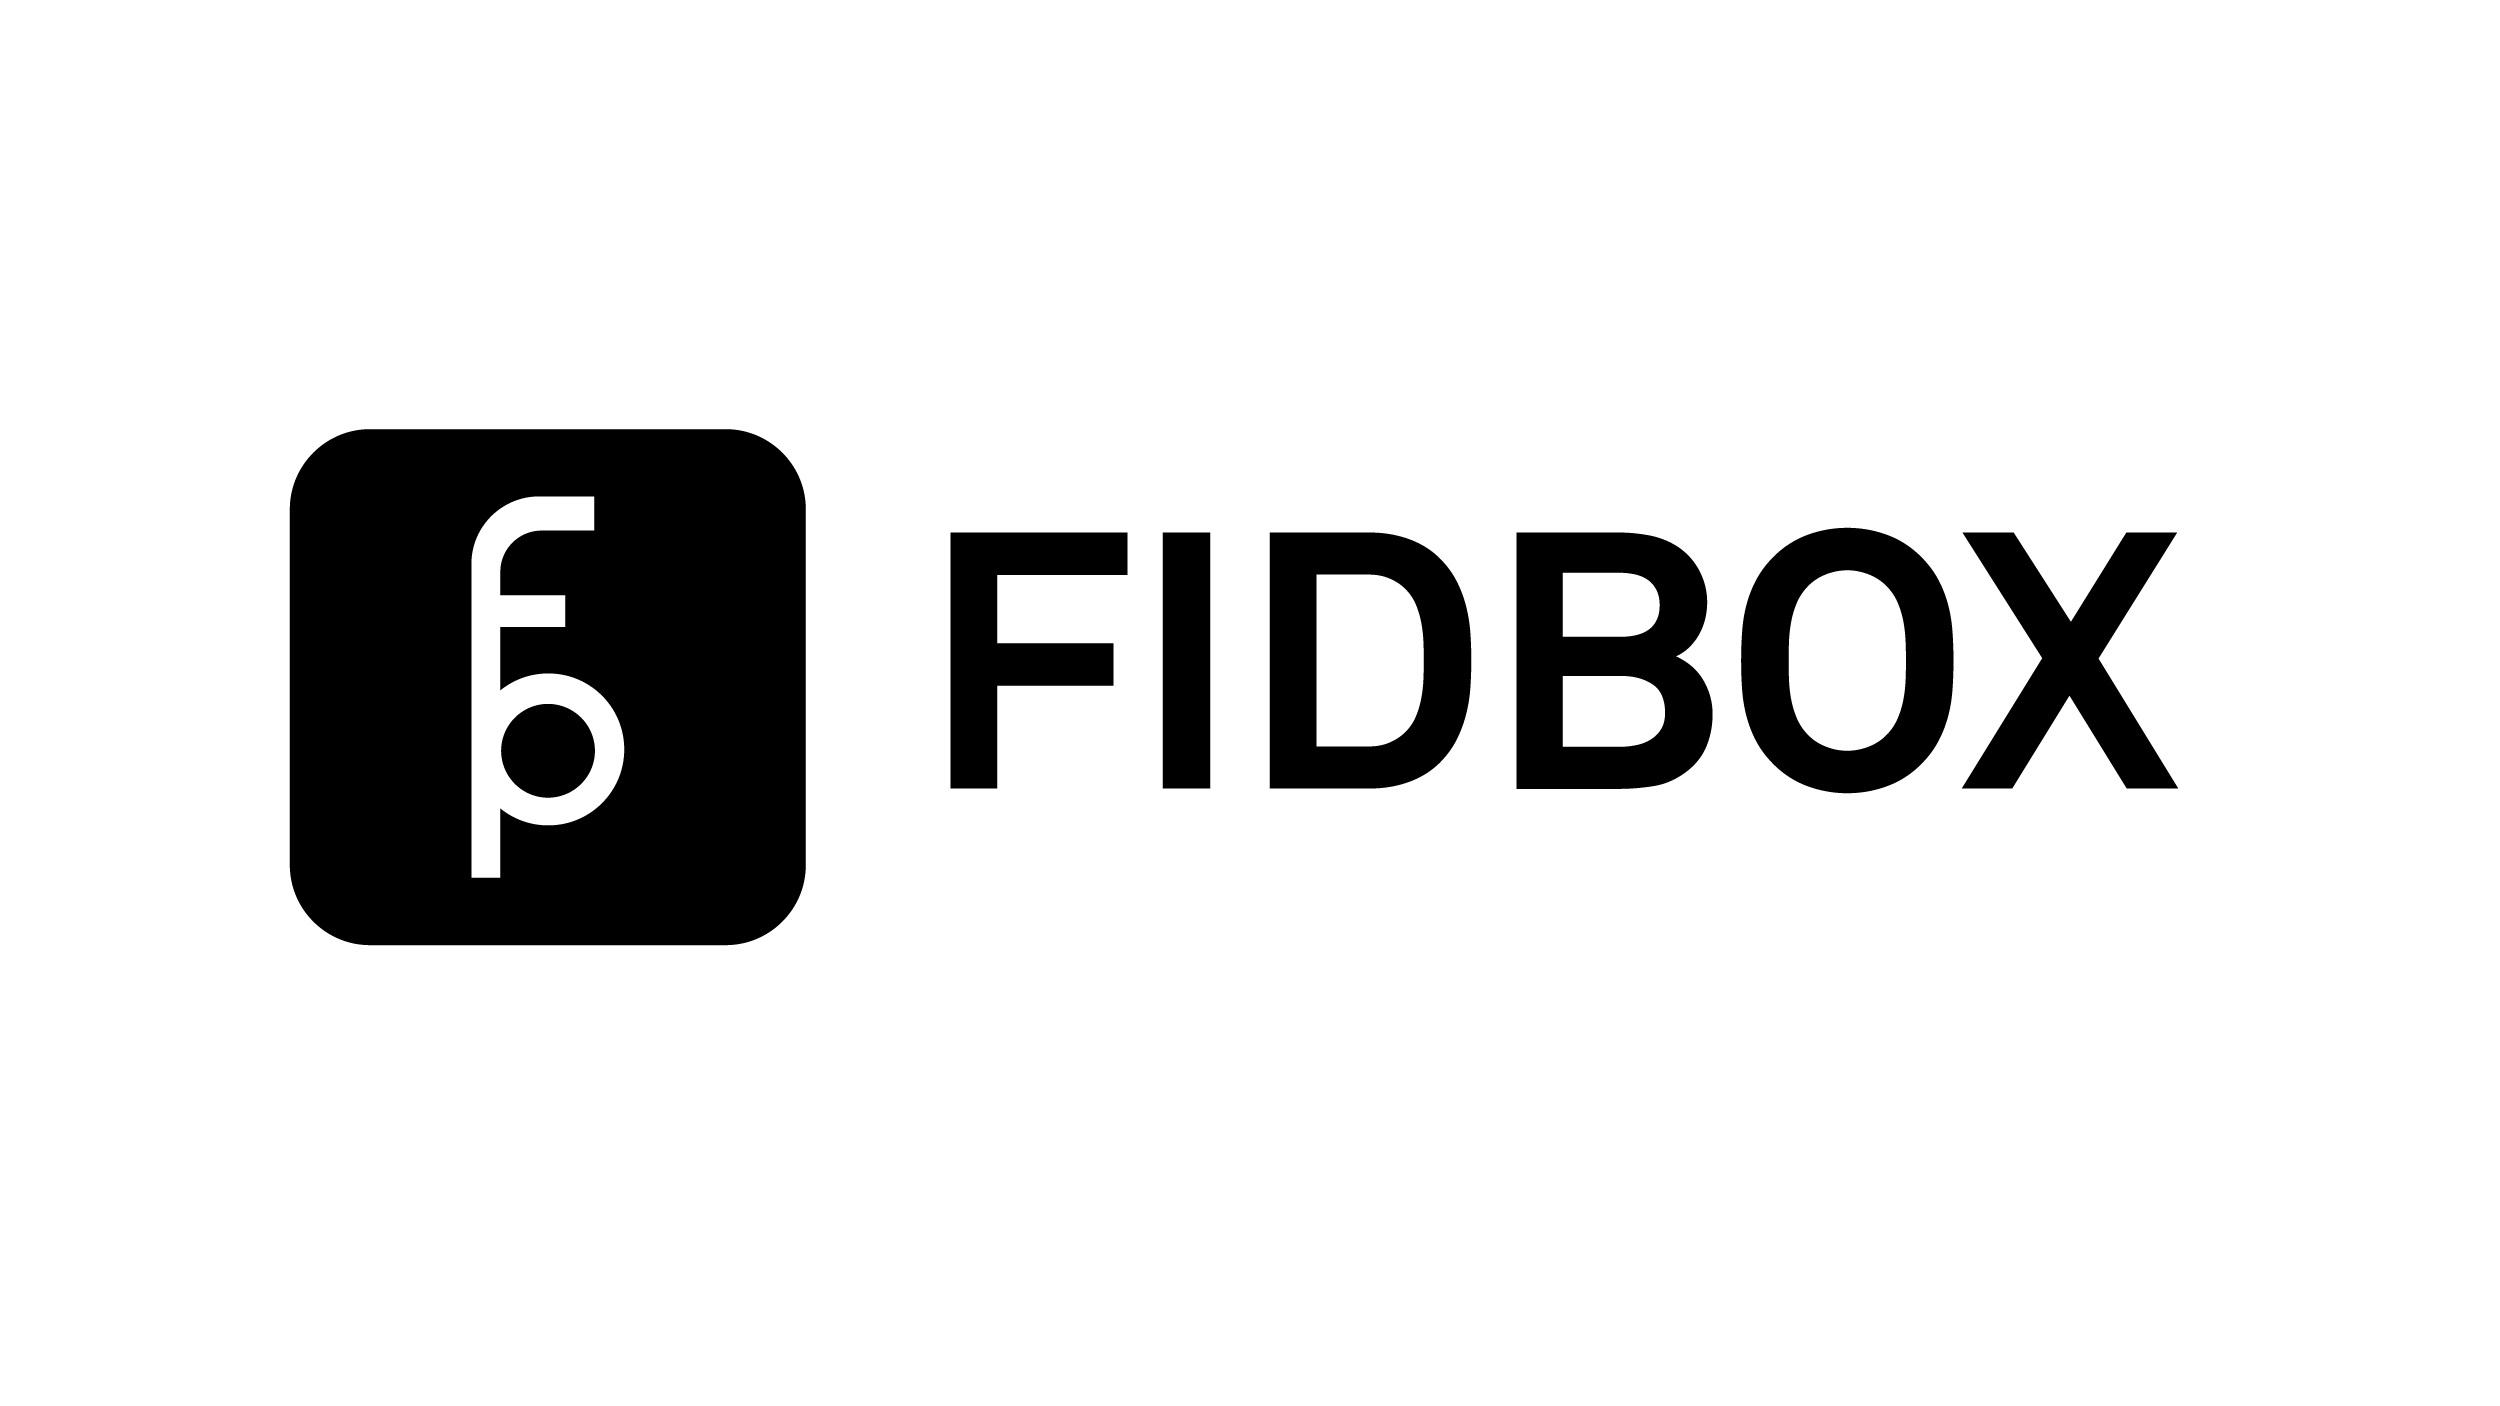 fidbox-logo.png